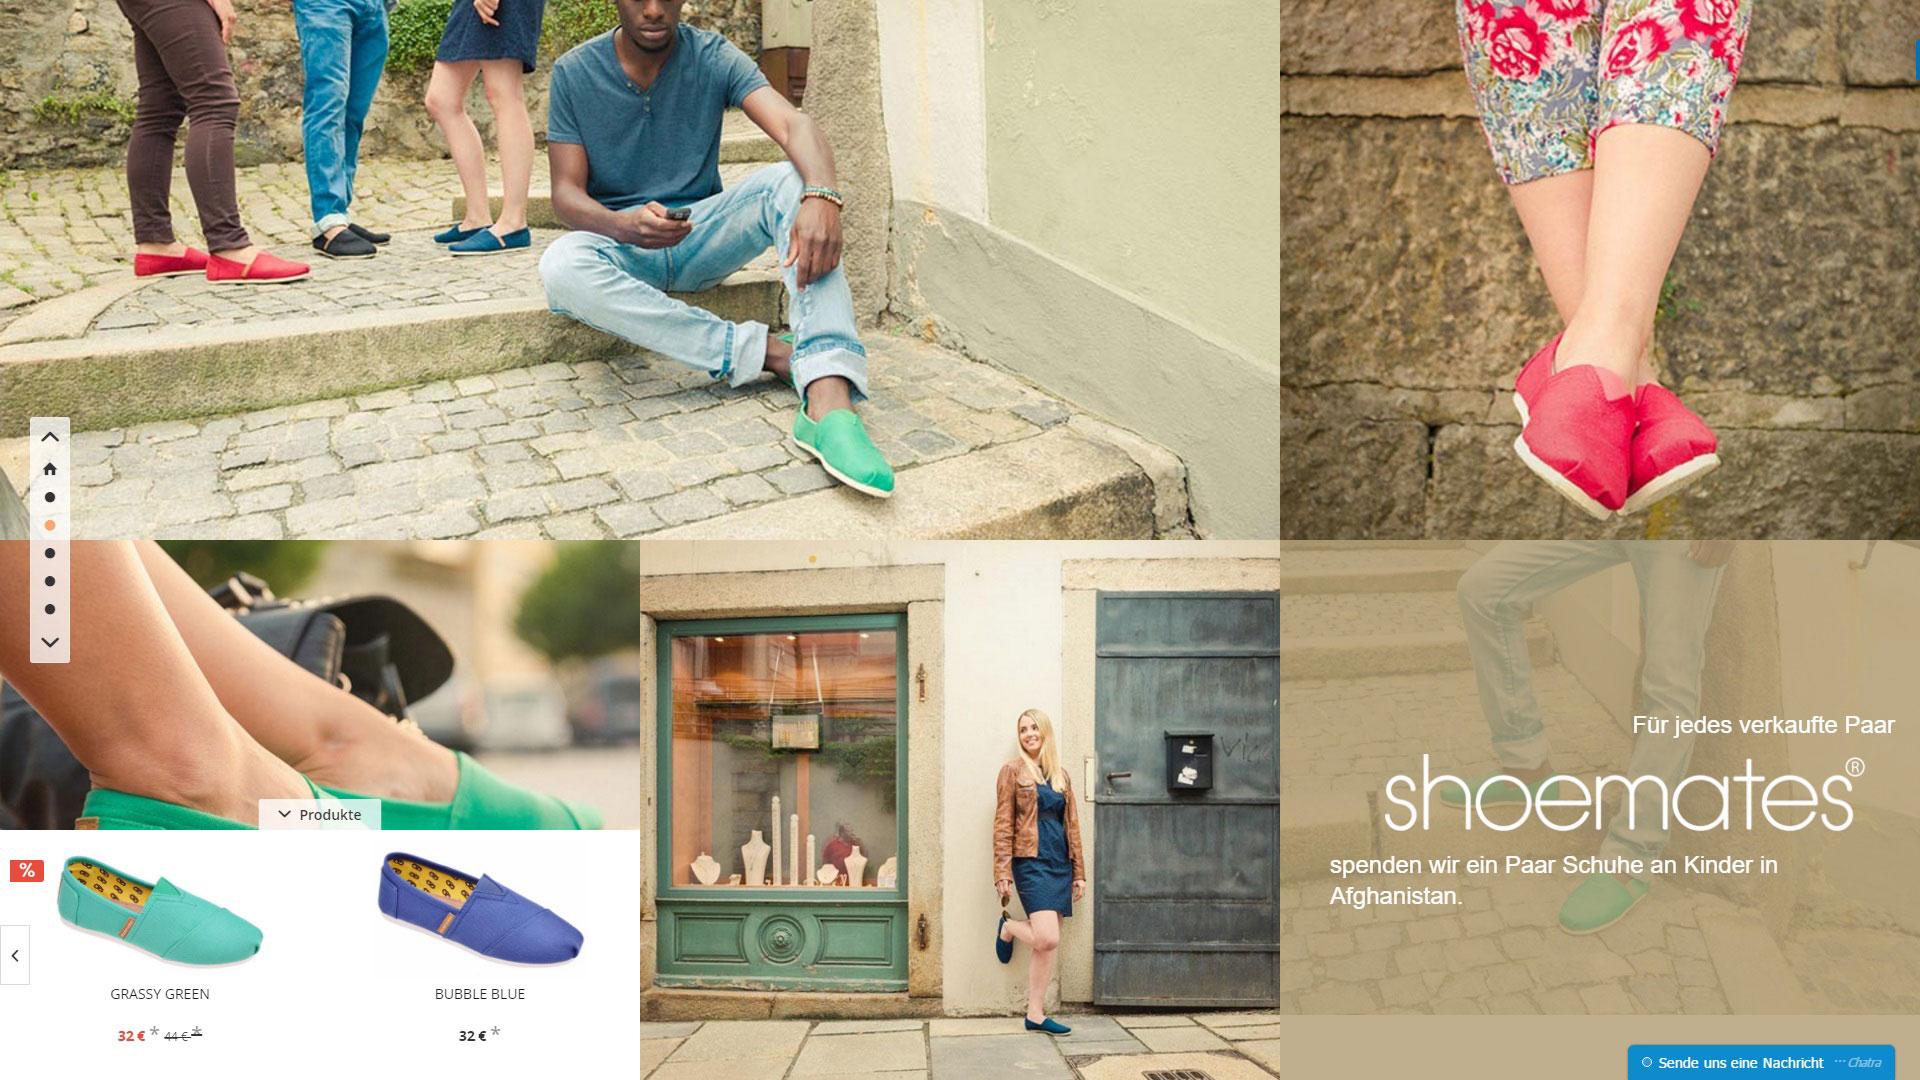 Shoemates-schuhe57f3b3dfdf3d6